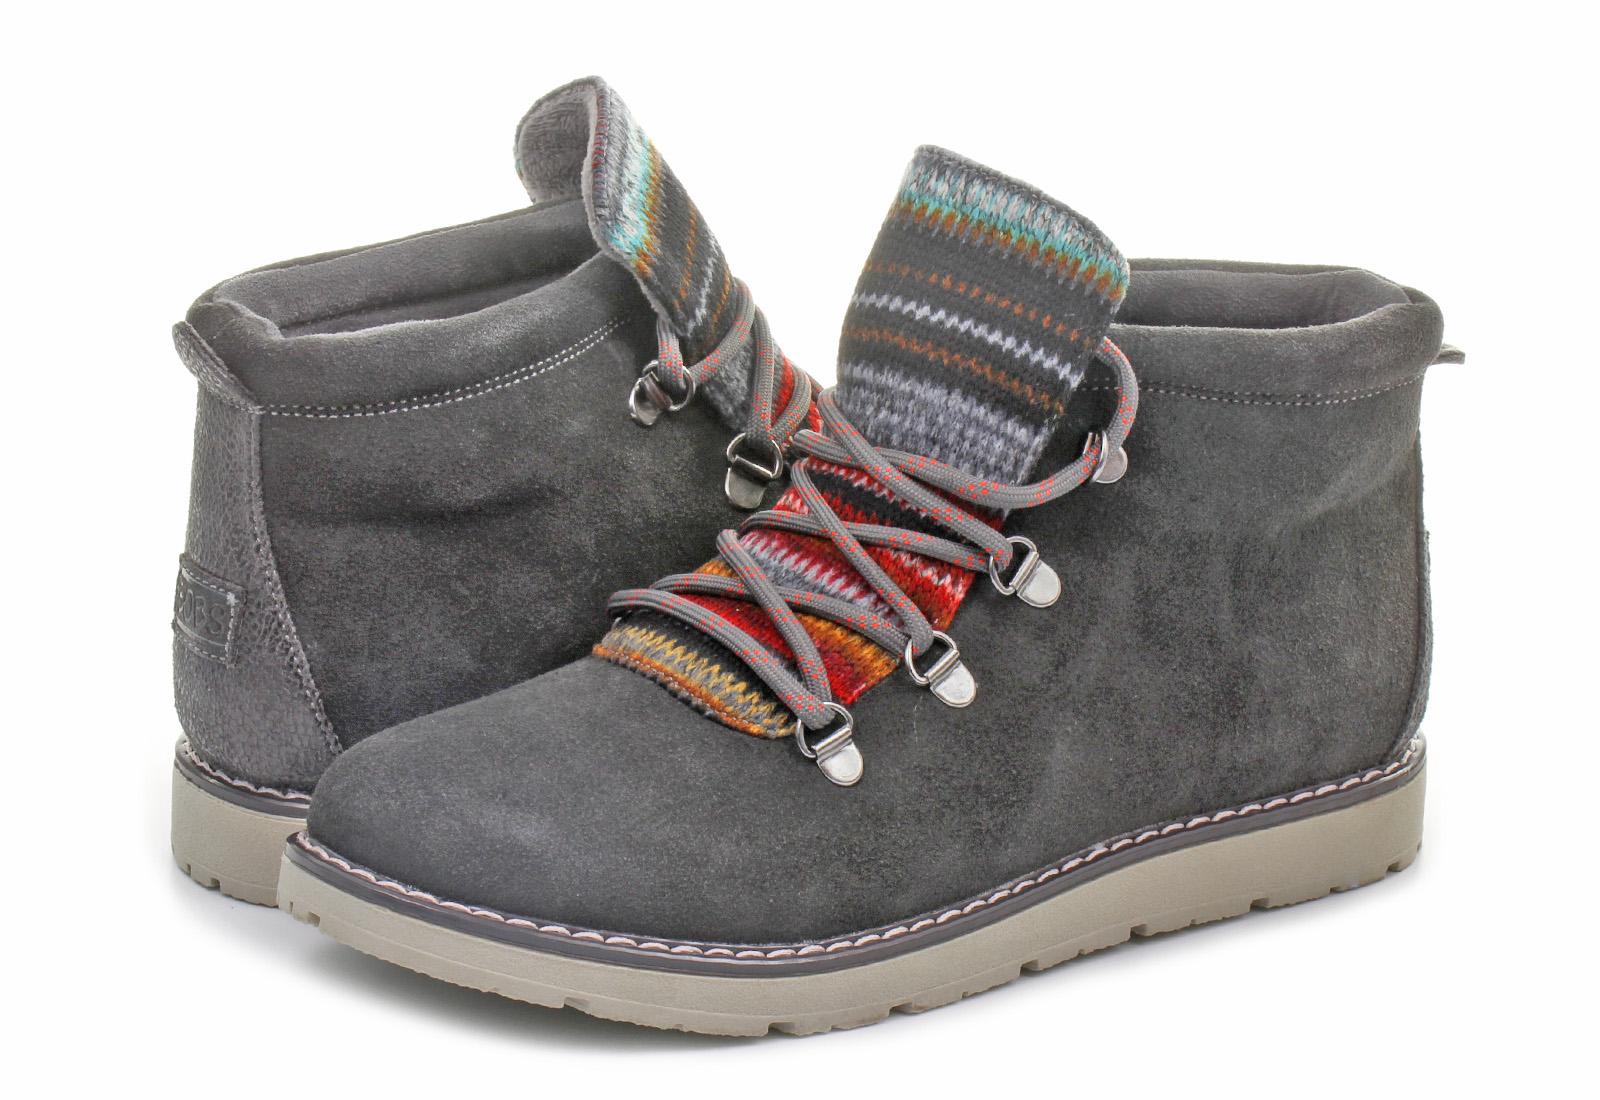 skechers shoes bobs alpine smores 34134 ccl